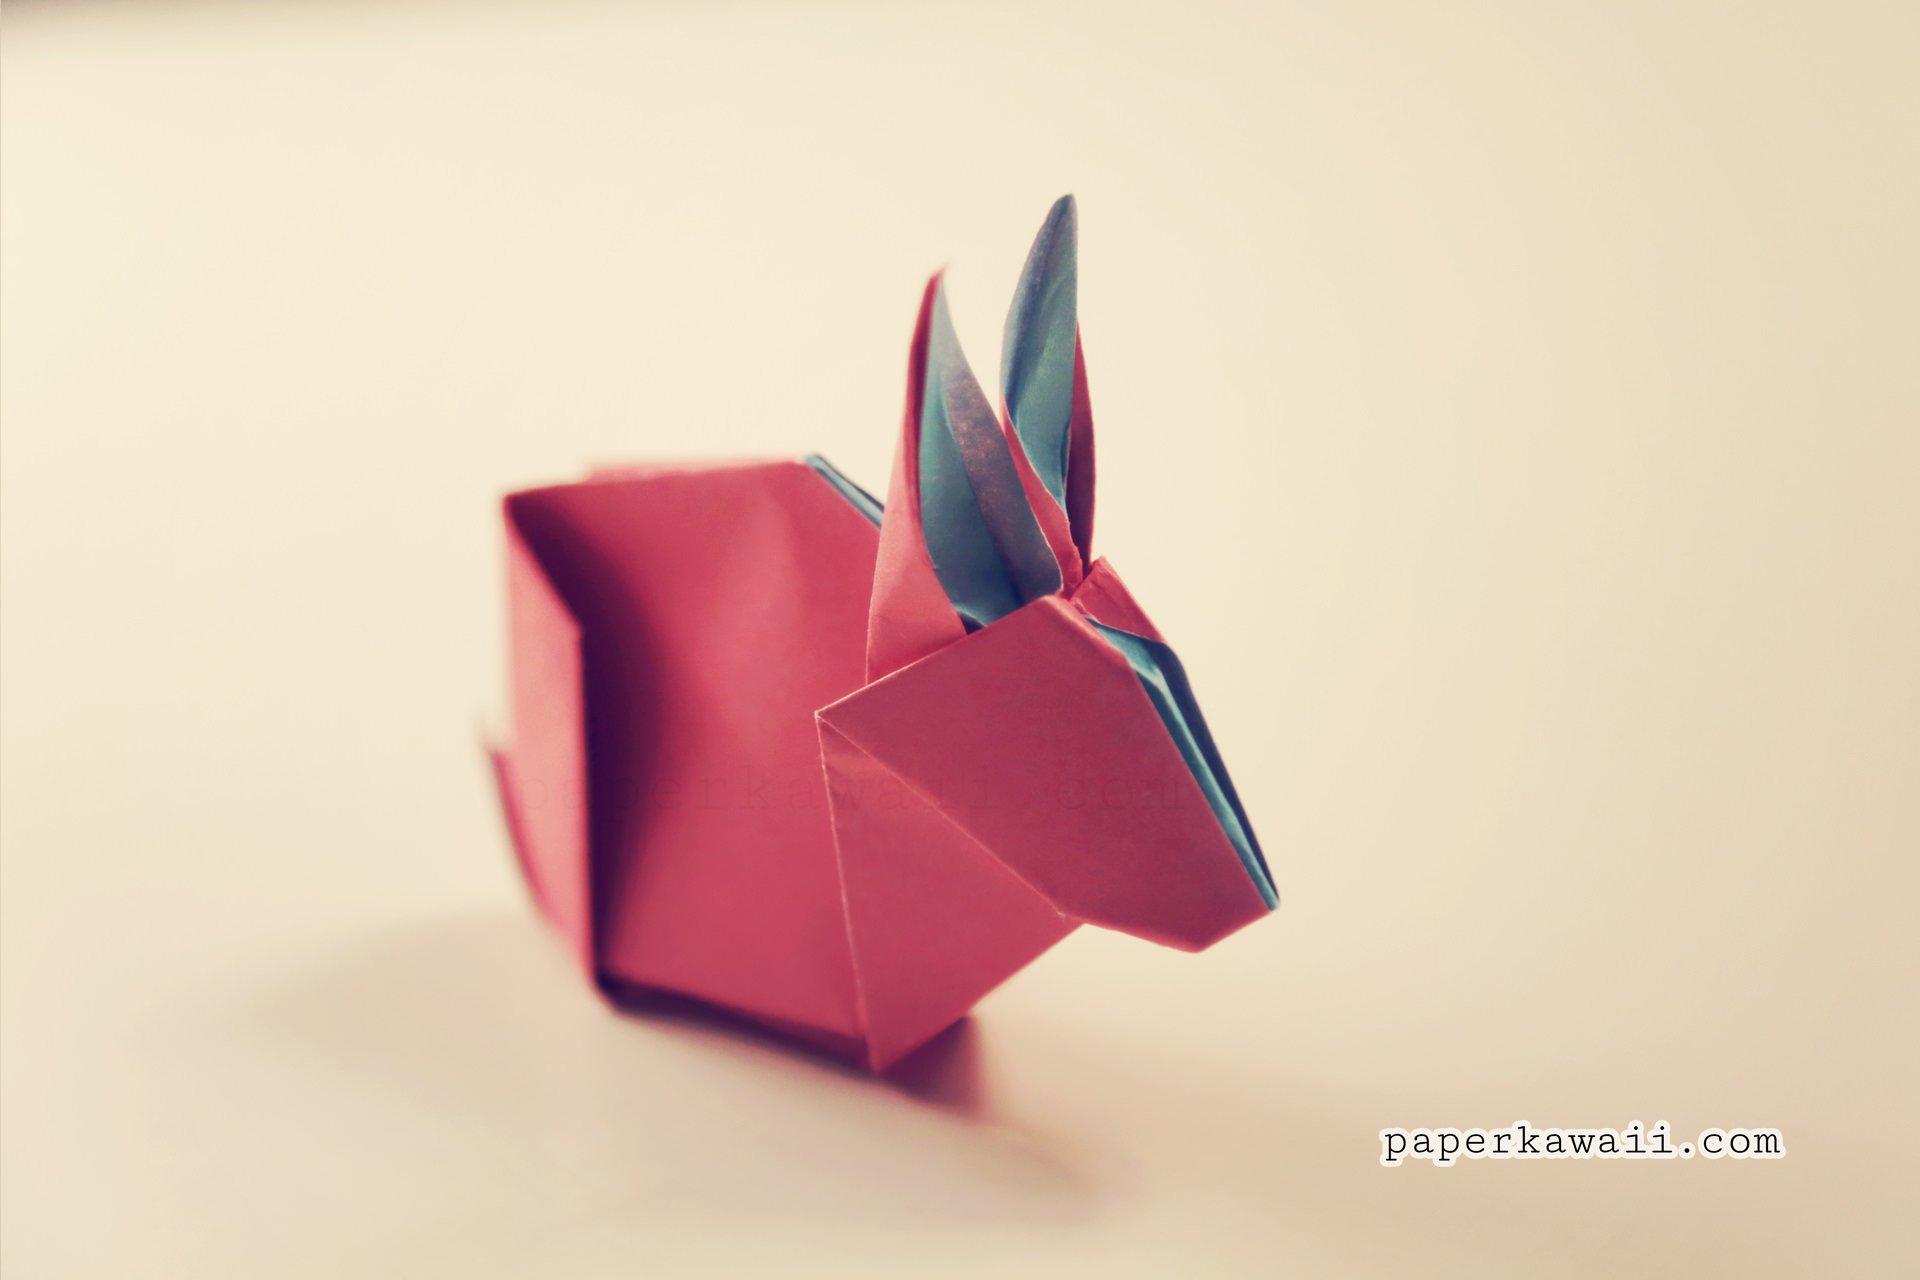 rabbit heart diagram ge adora refrigerator wiring origami bunny tutorial and paper kawaii